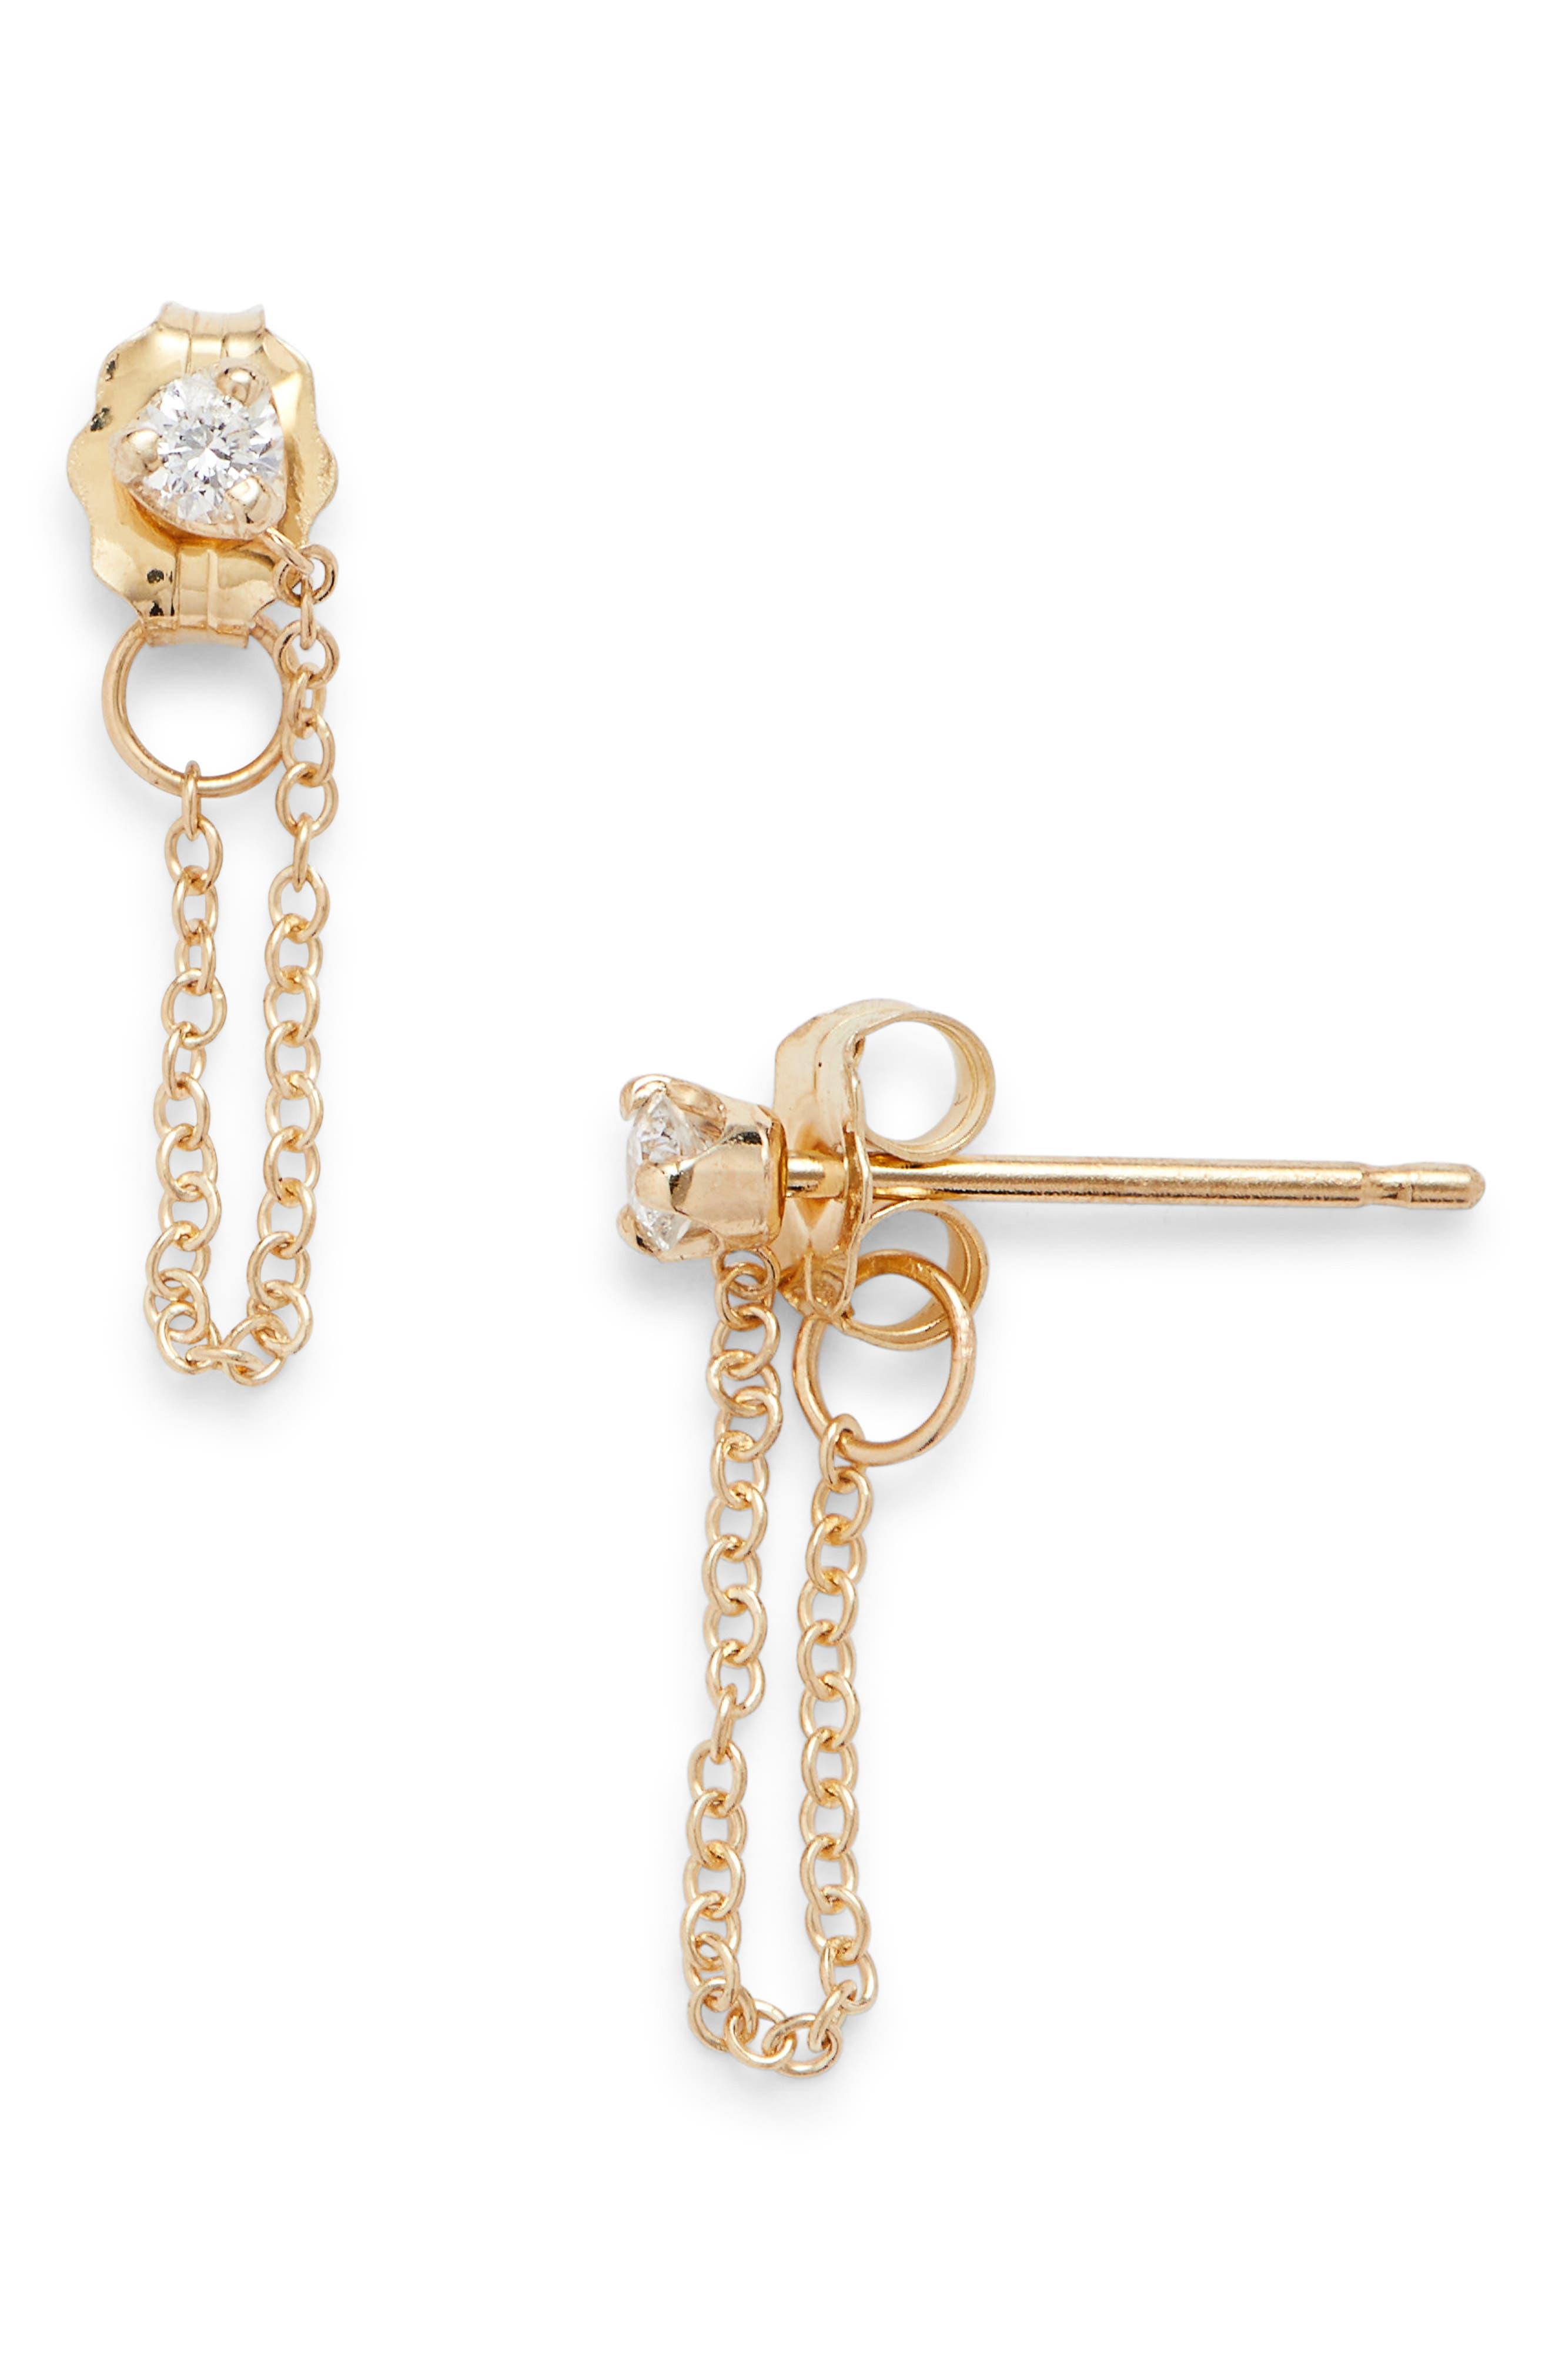 Diamond Chain Stud Earrings,                             Main thumbnail 1, color,                             710